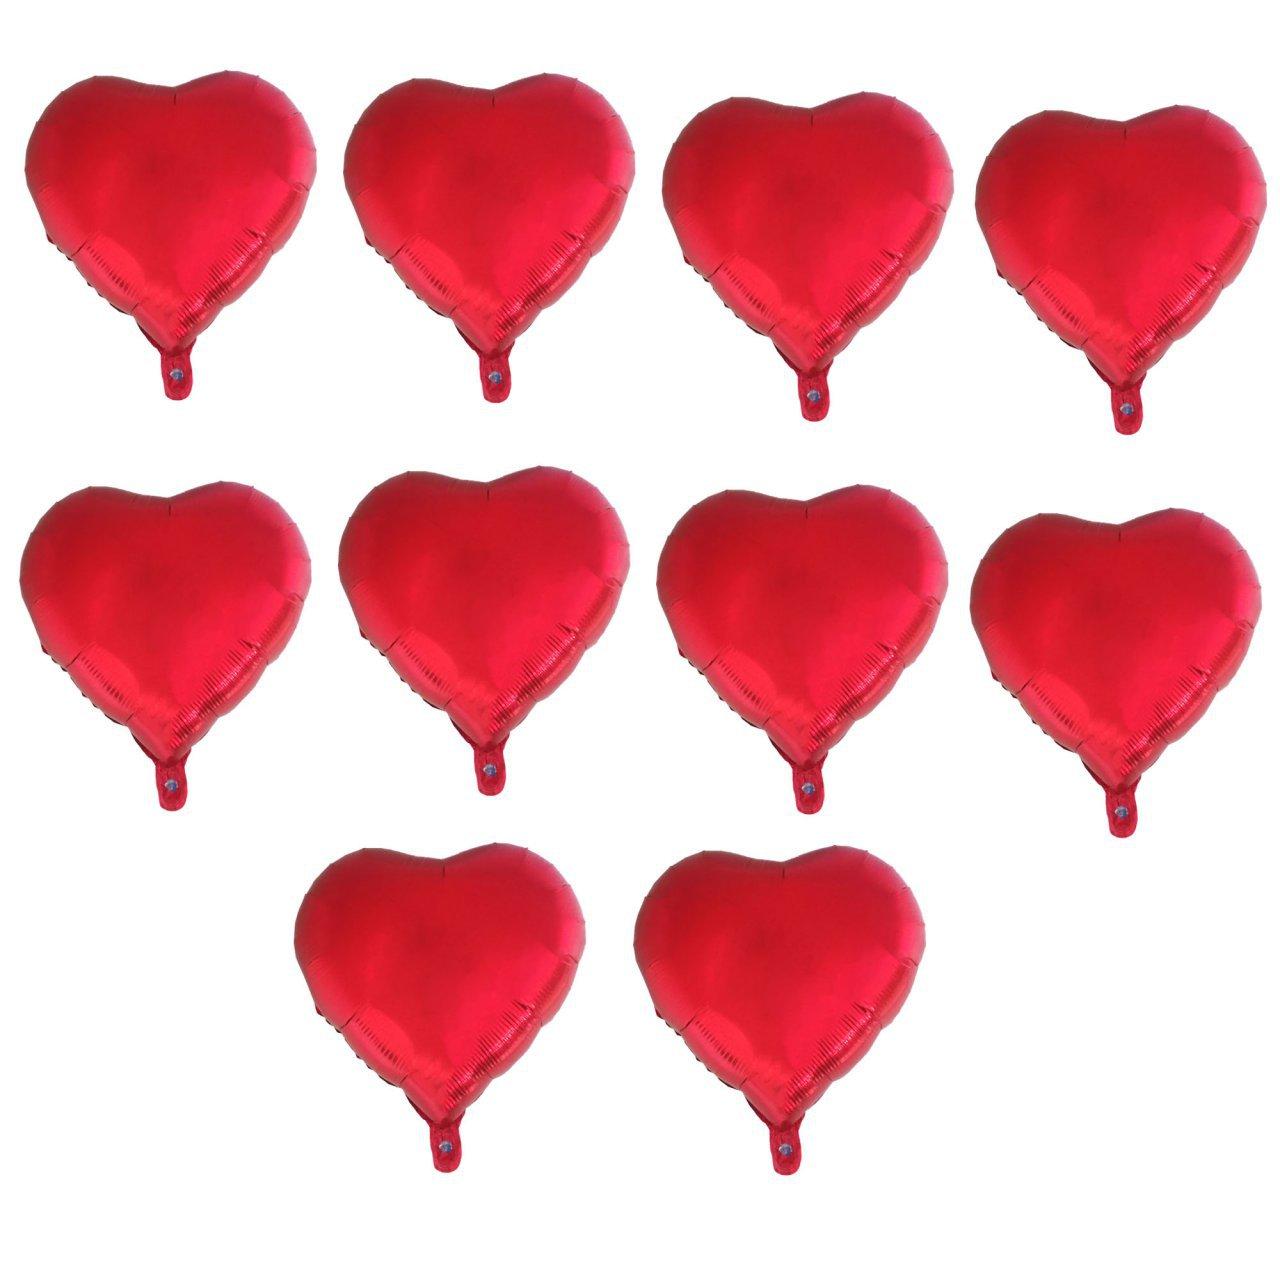 بادکنک فویلی طرح Heart کد 206 بسته 10 عددی